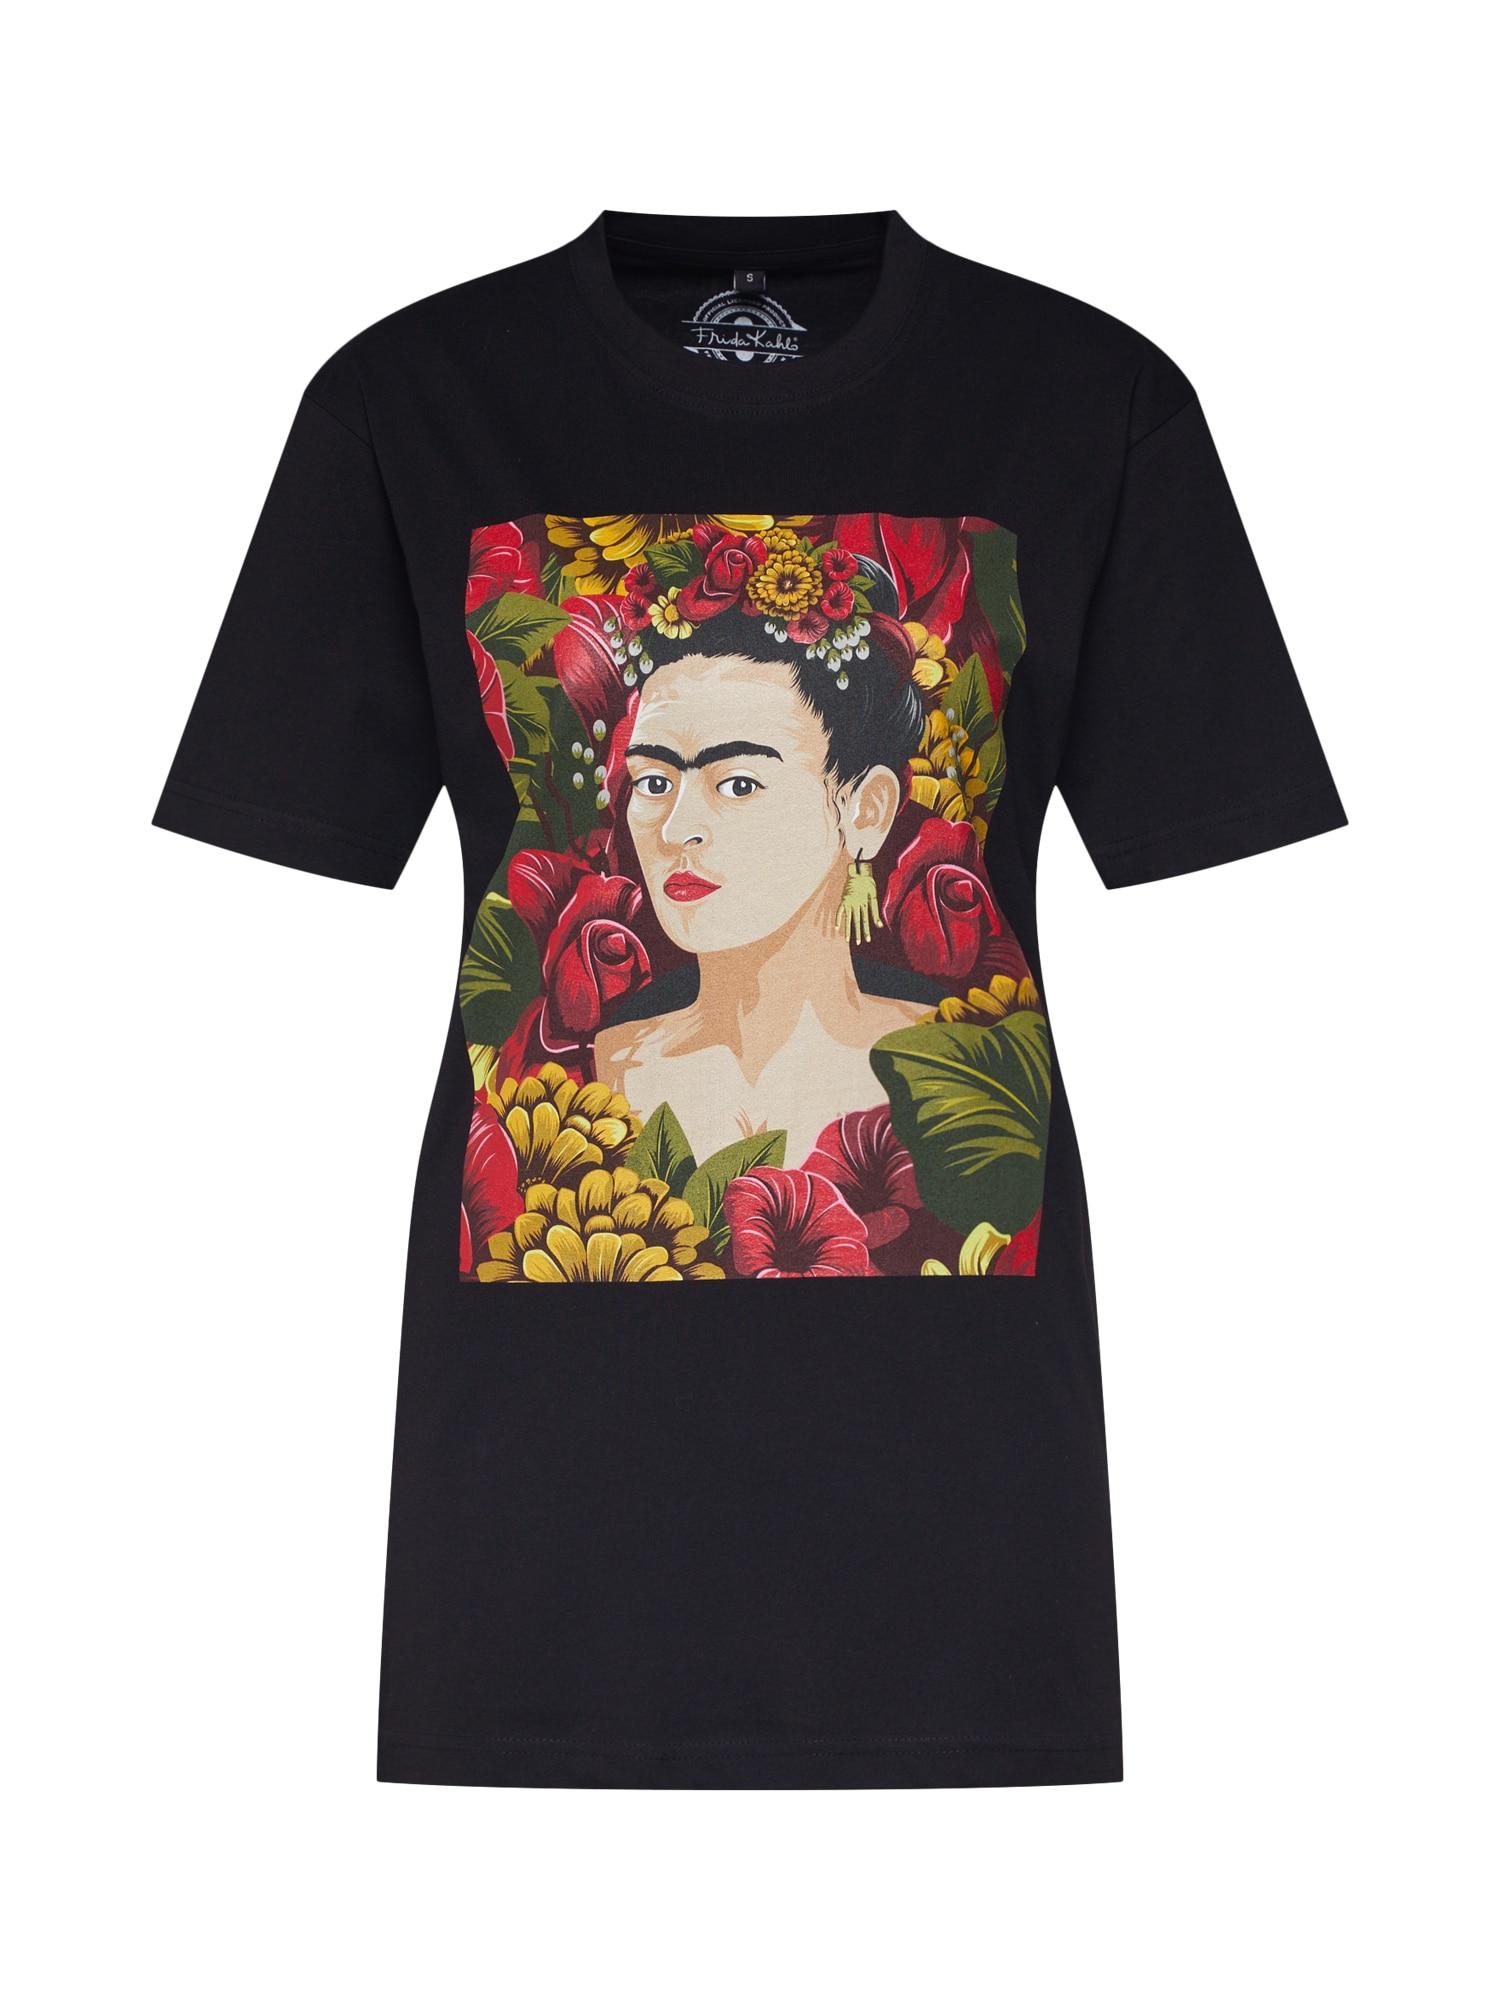 Tričko Frida Kahlo Portrait mix barev černá Merchcode